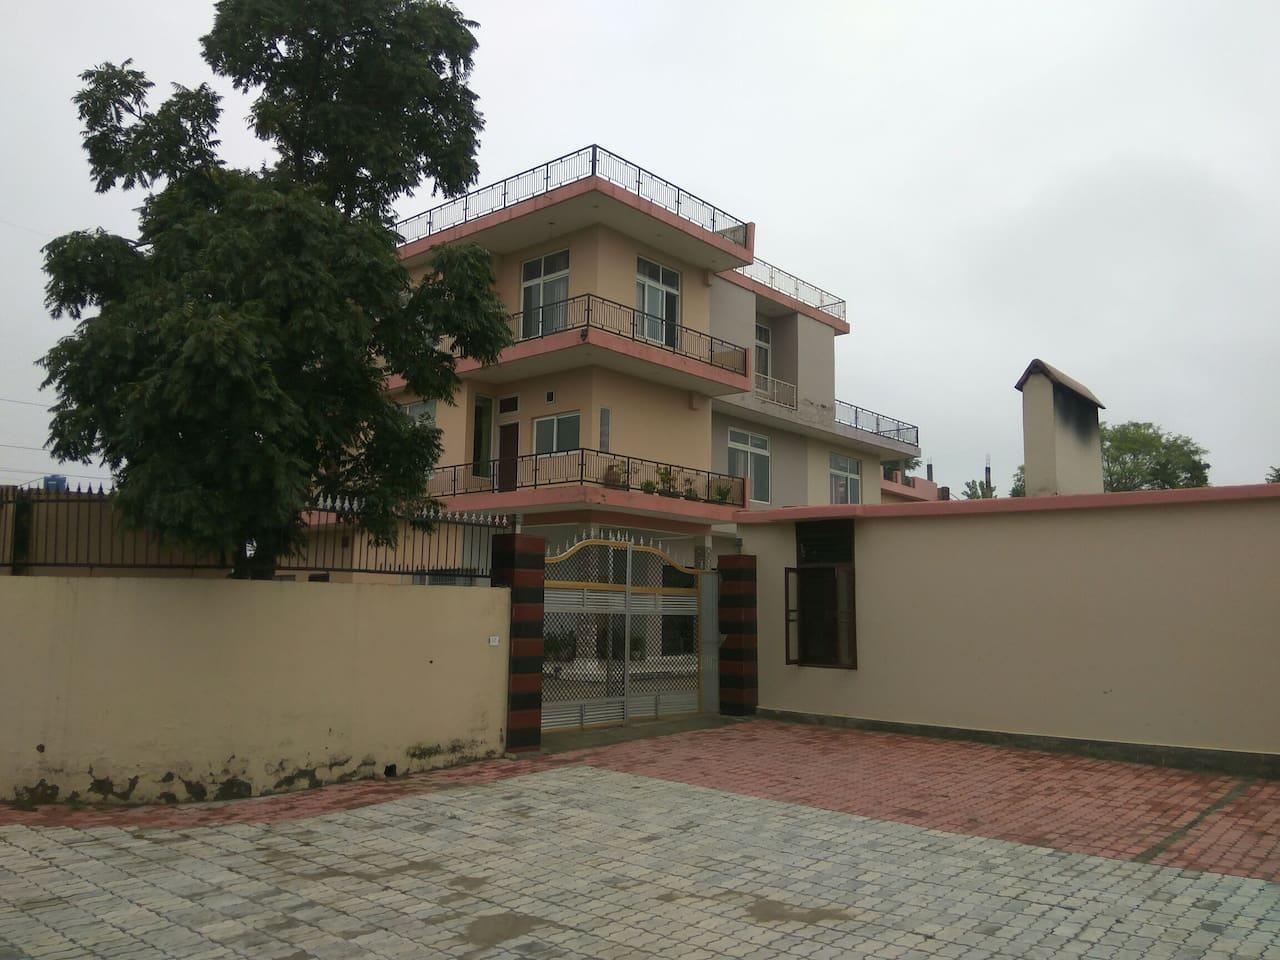 Main entrance to the Saini Farm House